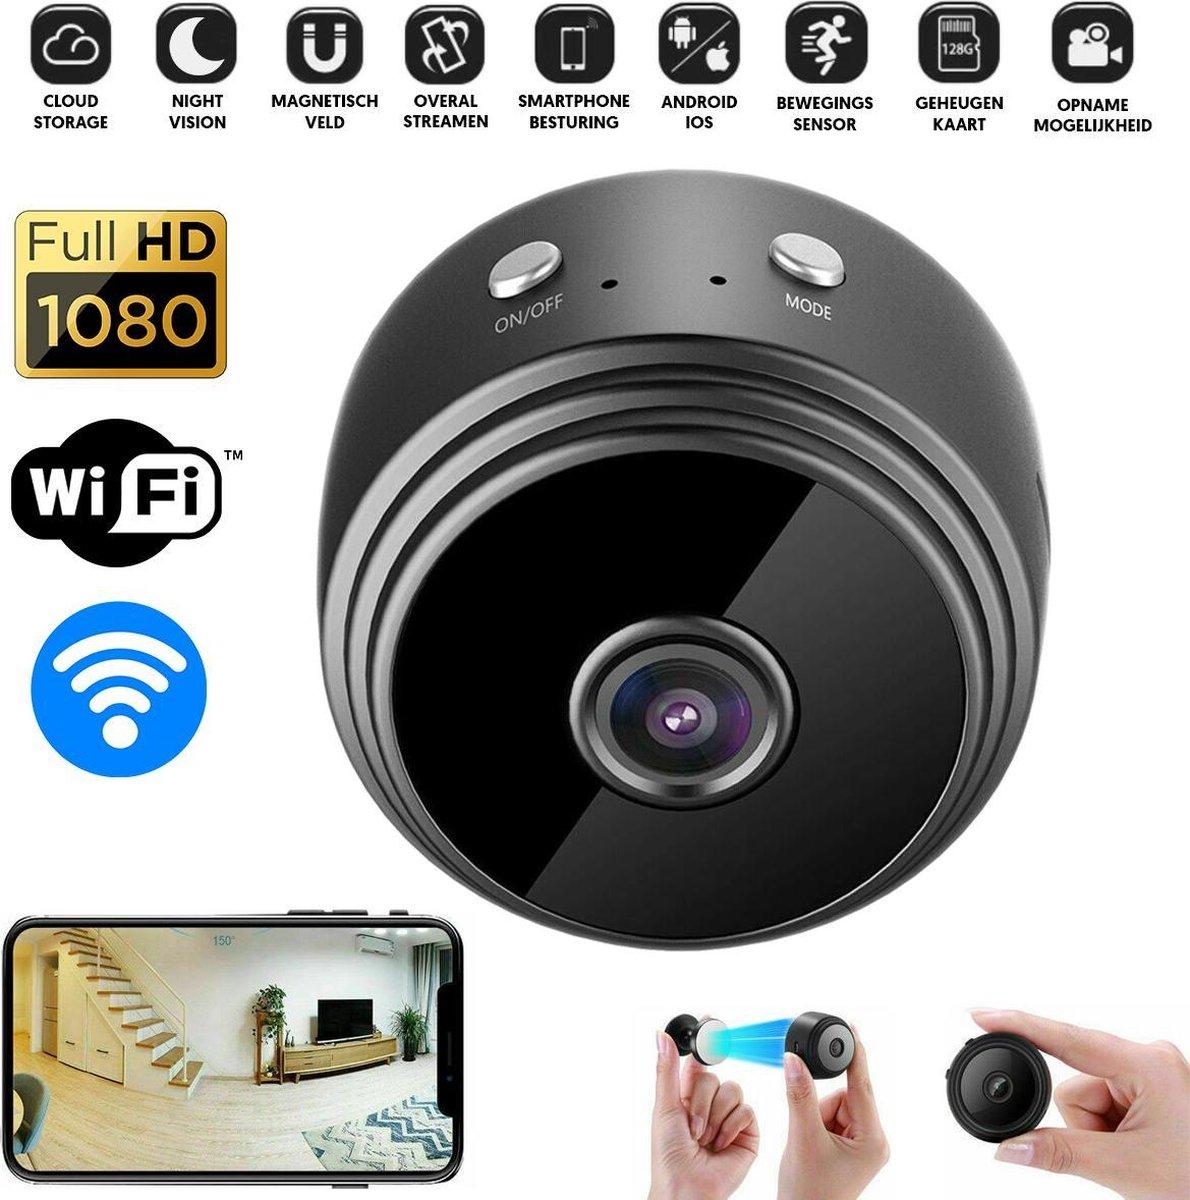 PIXMY - Smart Spy Camera 300mAh - Verborgen Camera - Mini Camera - Spy Cam - WiFi 1080 HD - Incl. SD